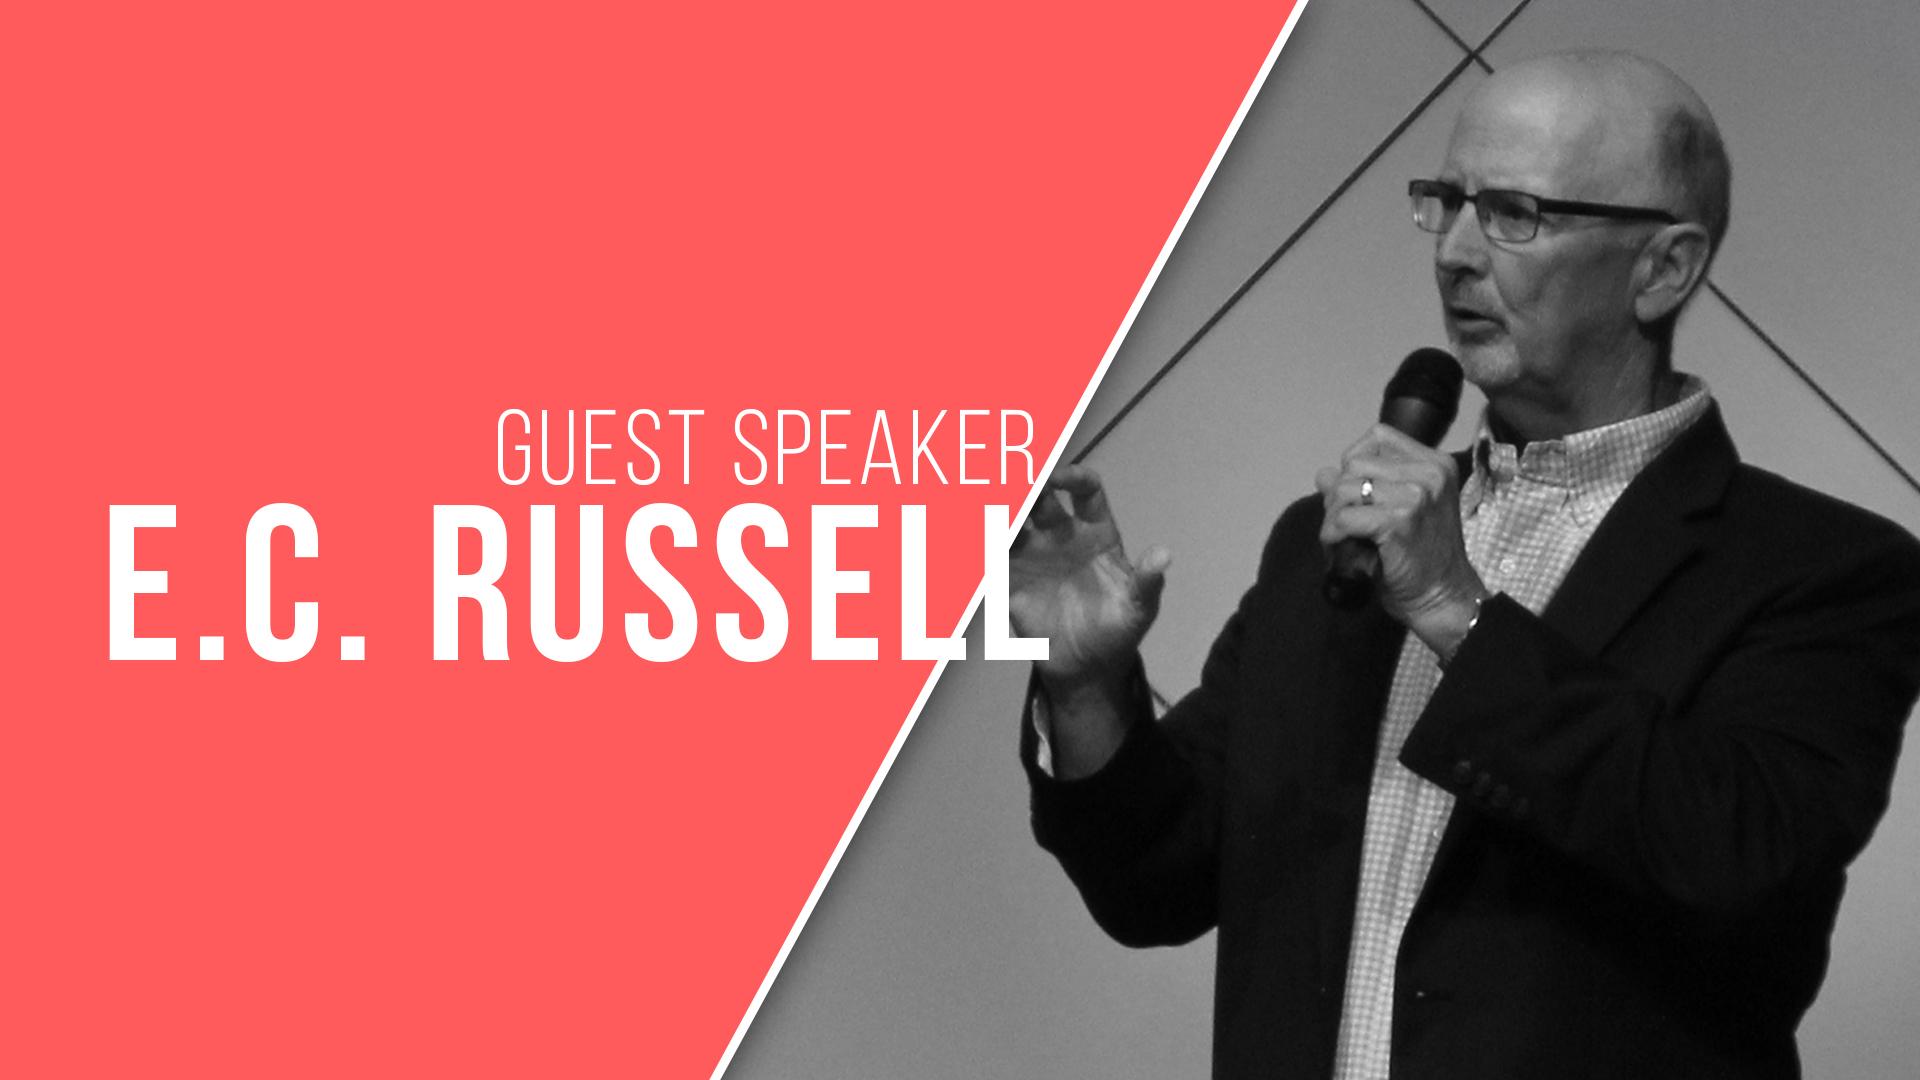 EC Russell Guest Speaker.jpg